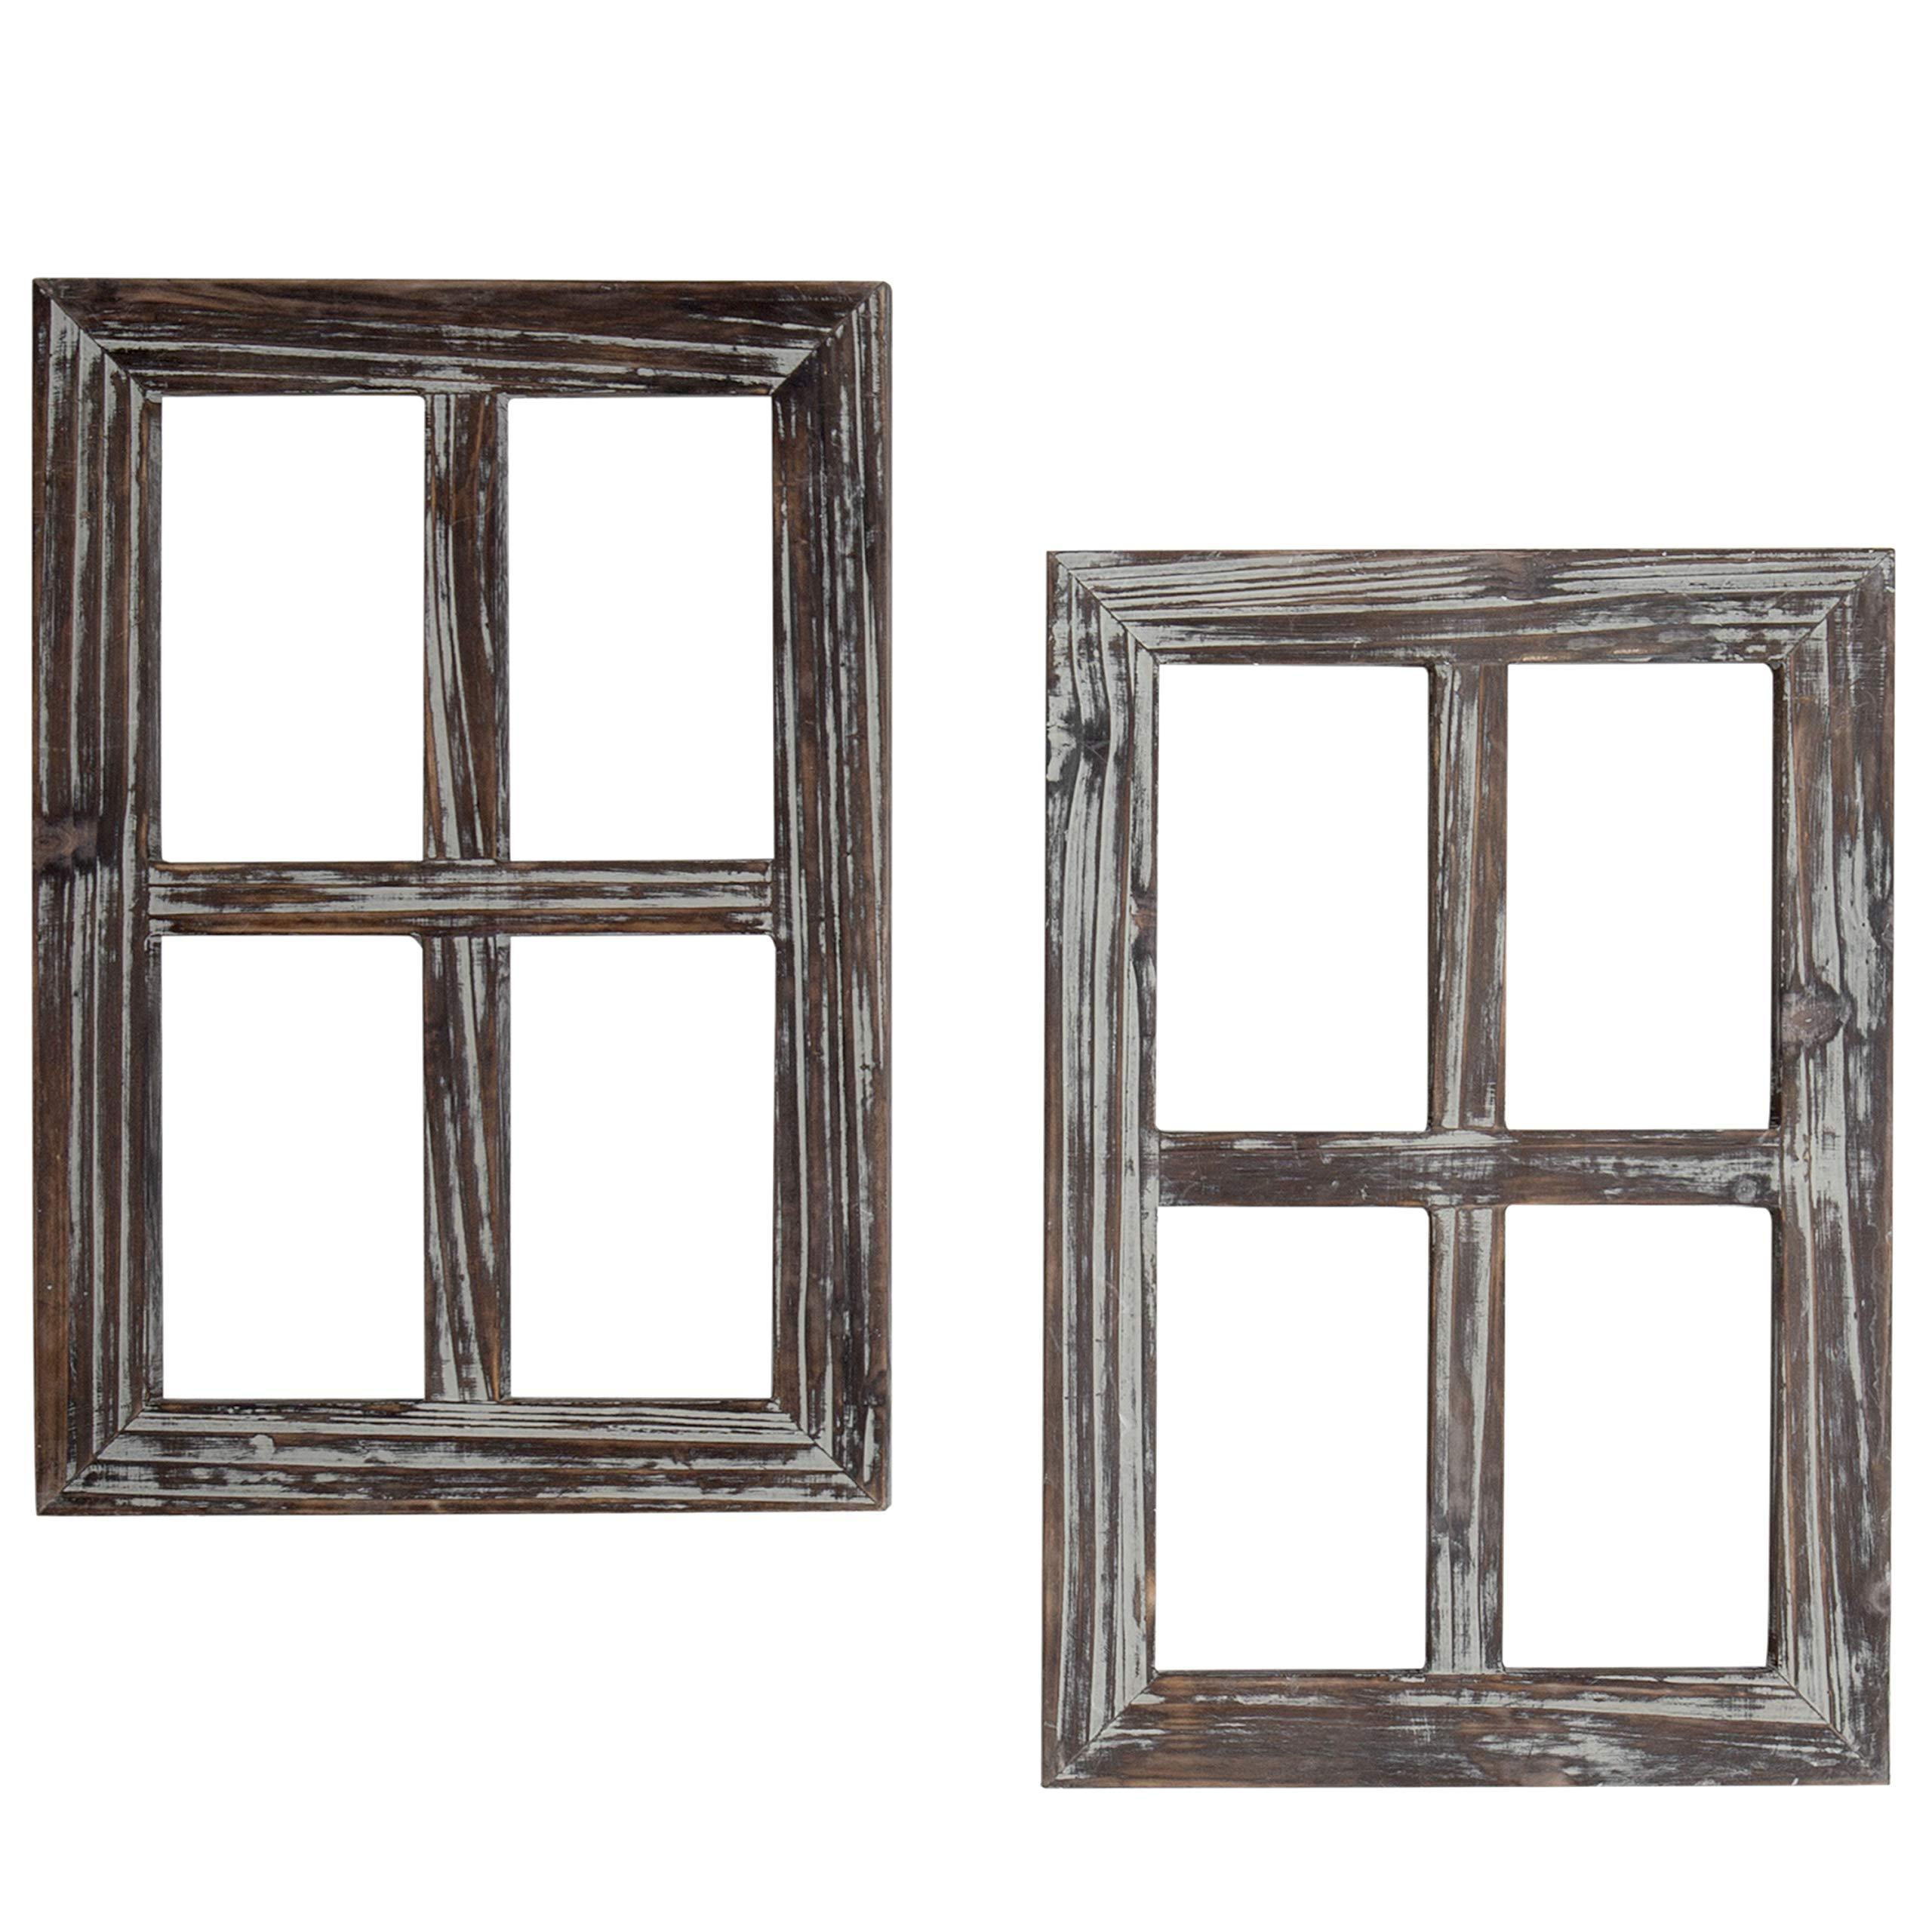 MyGift Rustic Whitewash Wood Window Frame Wall Decor, Set of 2 by MyGift